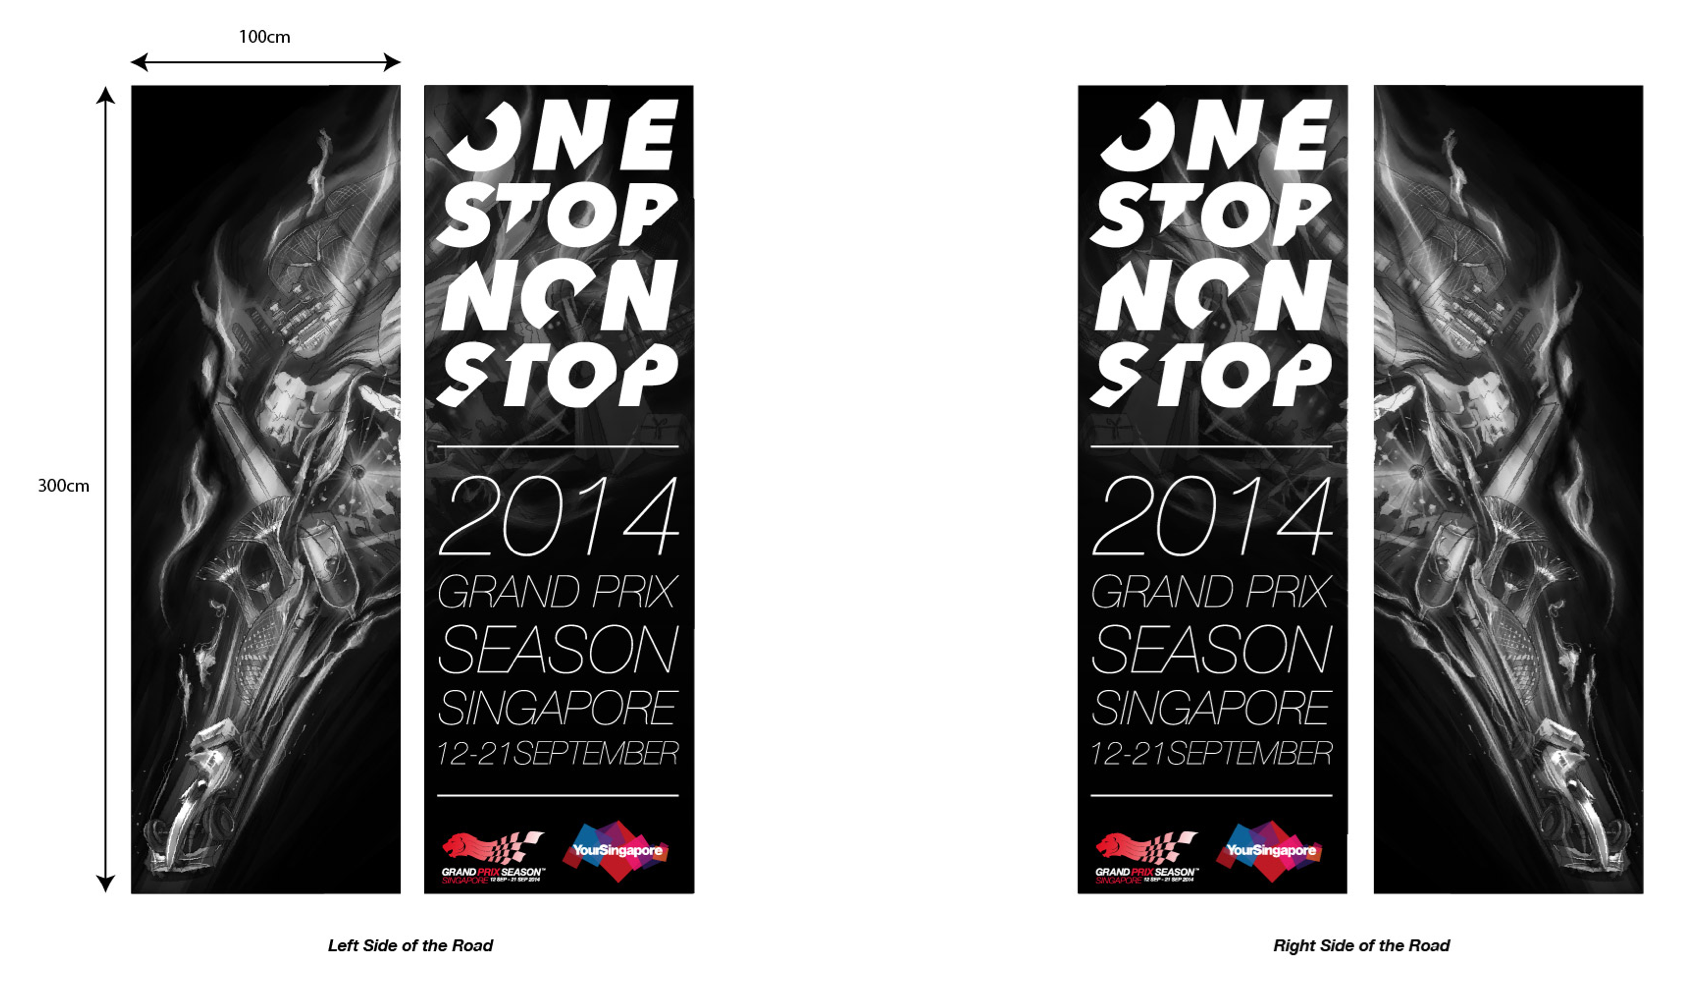 outeredit - f1 grand prix season singapore - banners